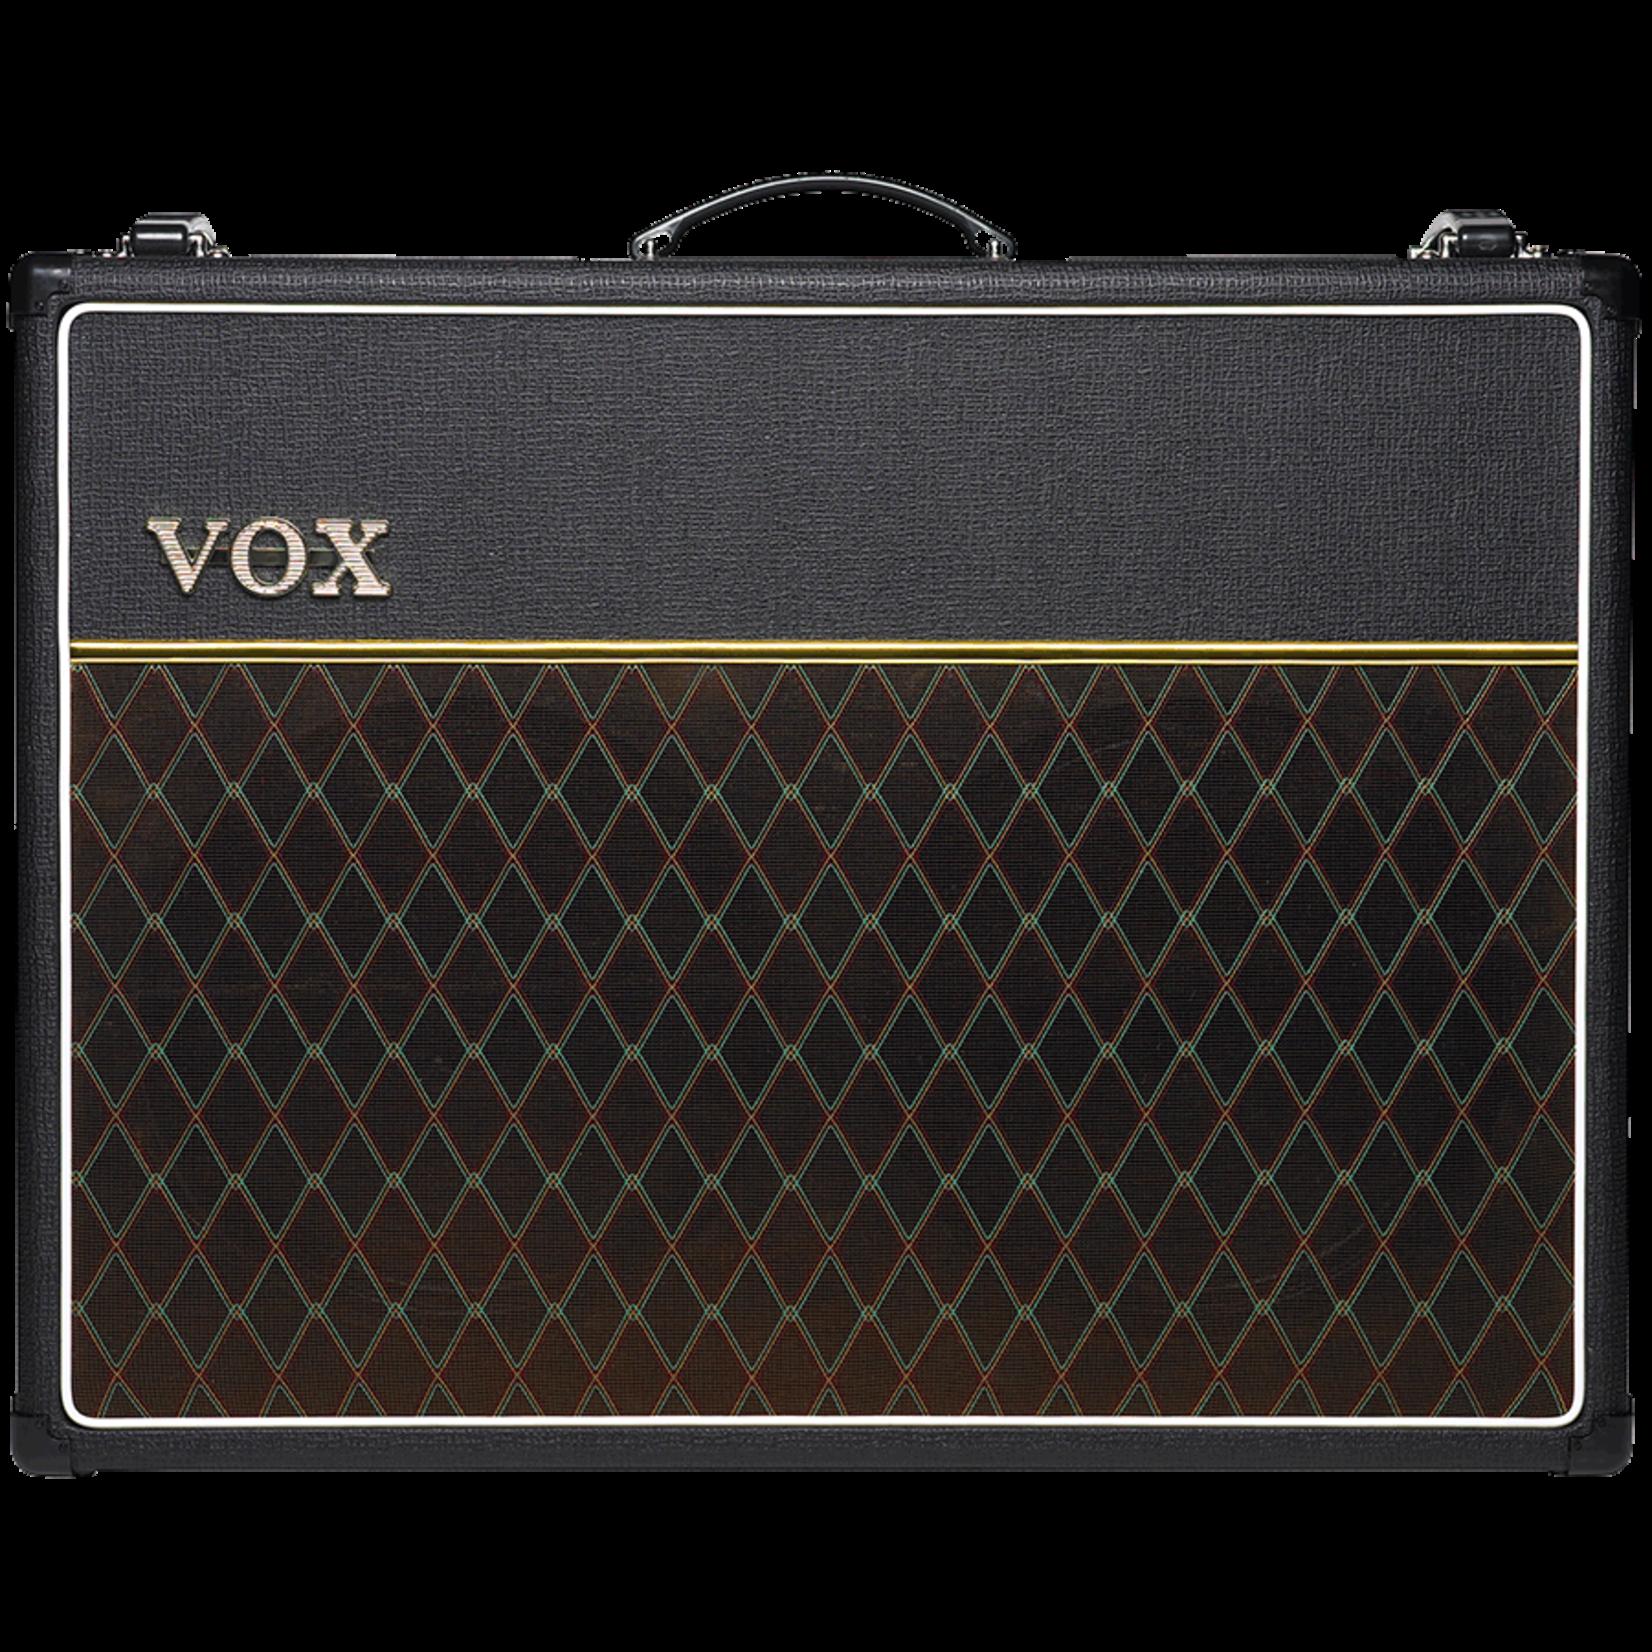 Vox Vox AC15C2 15 Watt 2x12 Guitar Amp